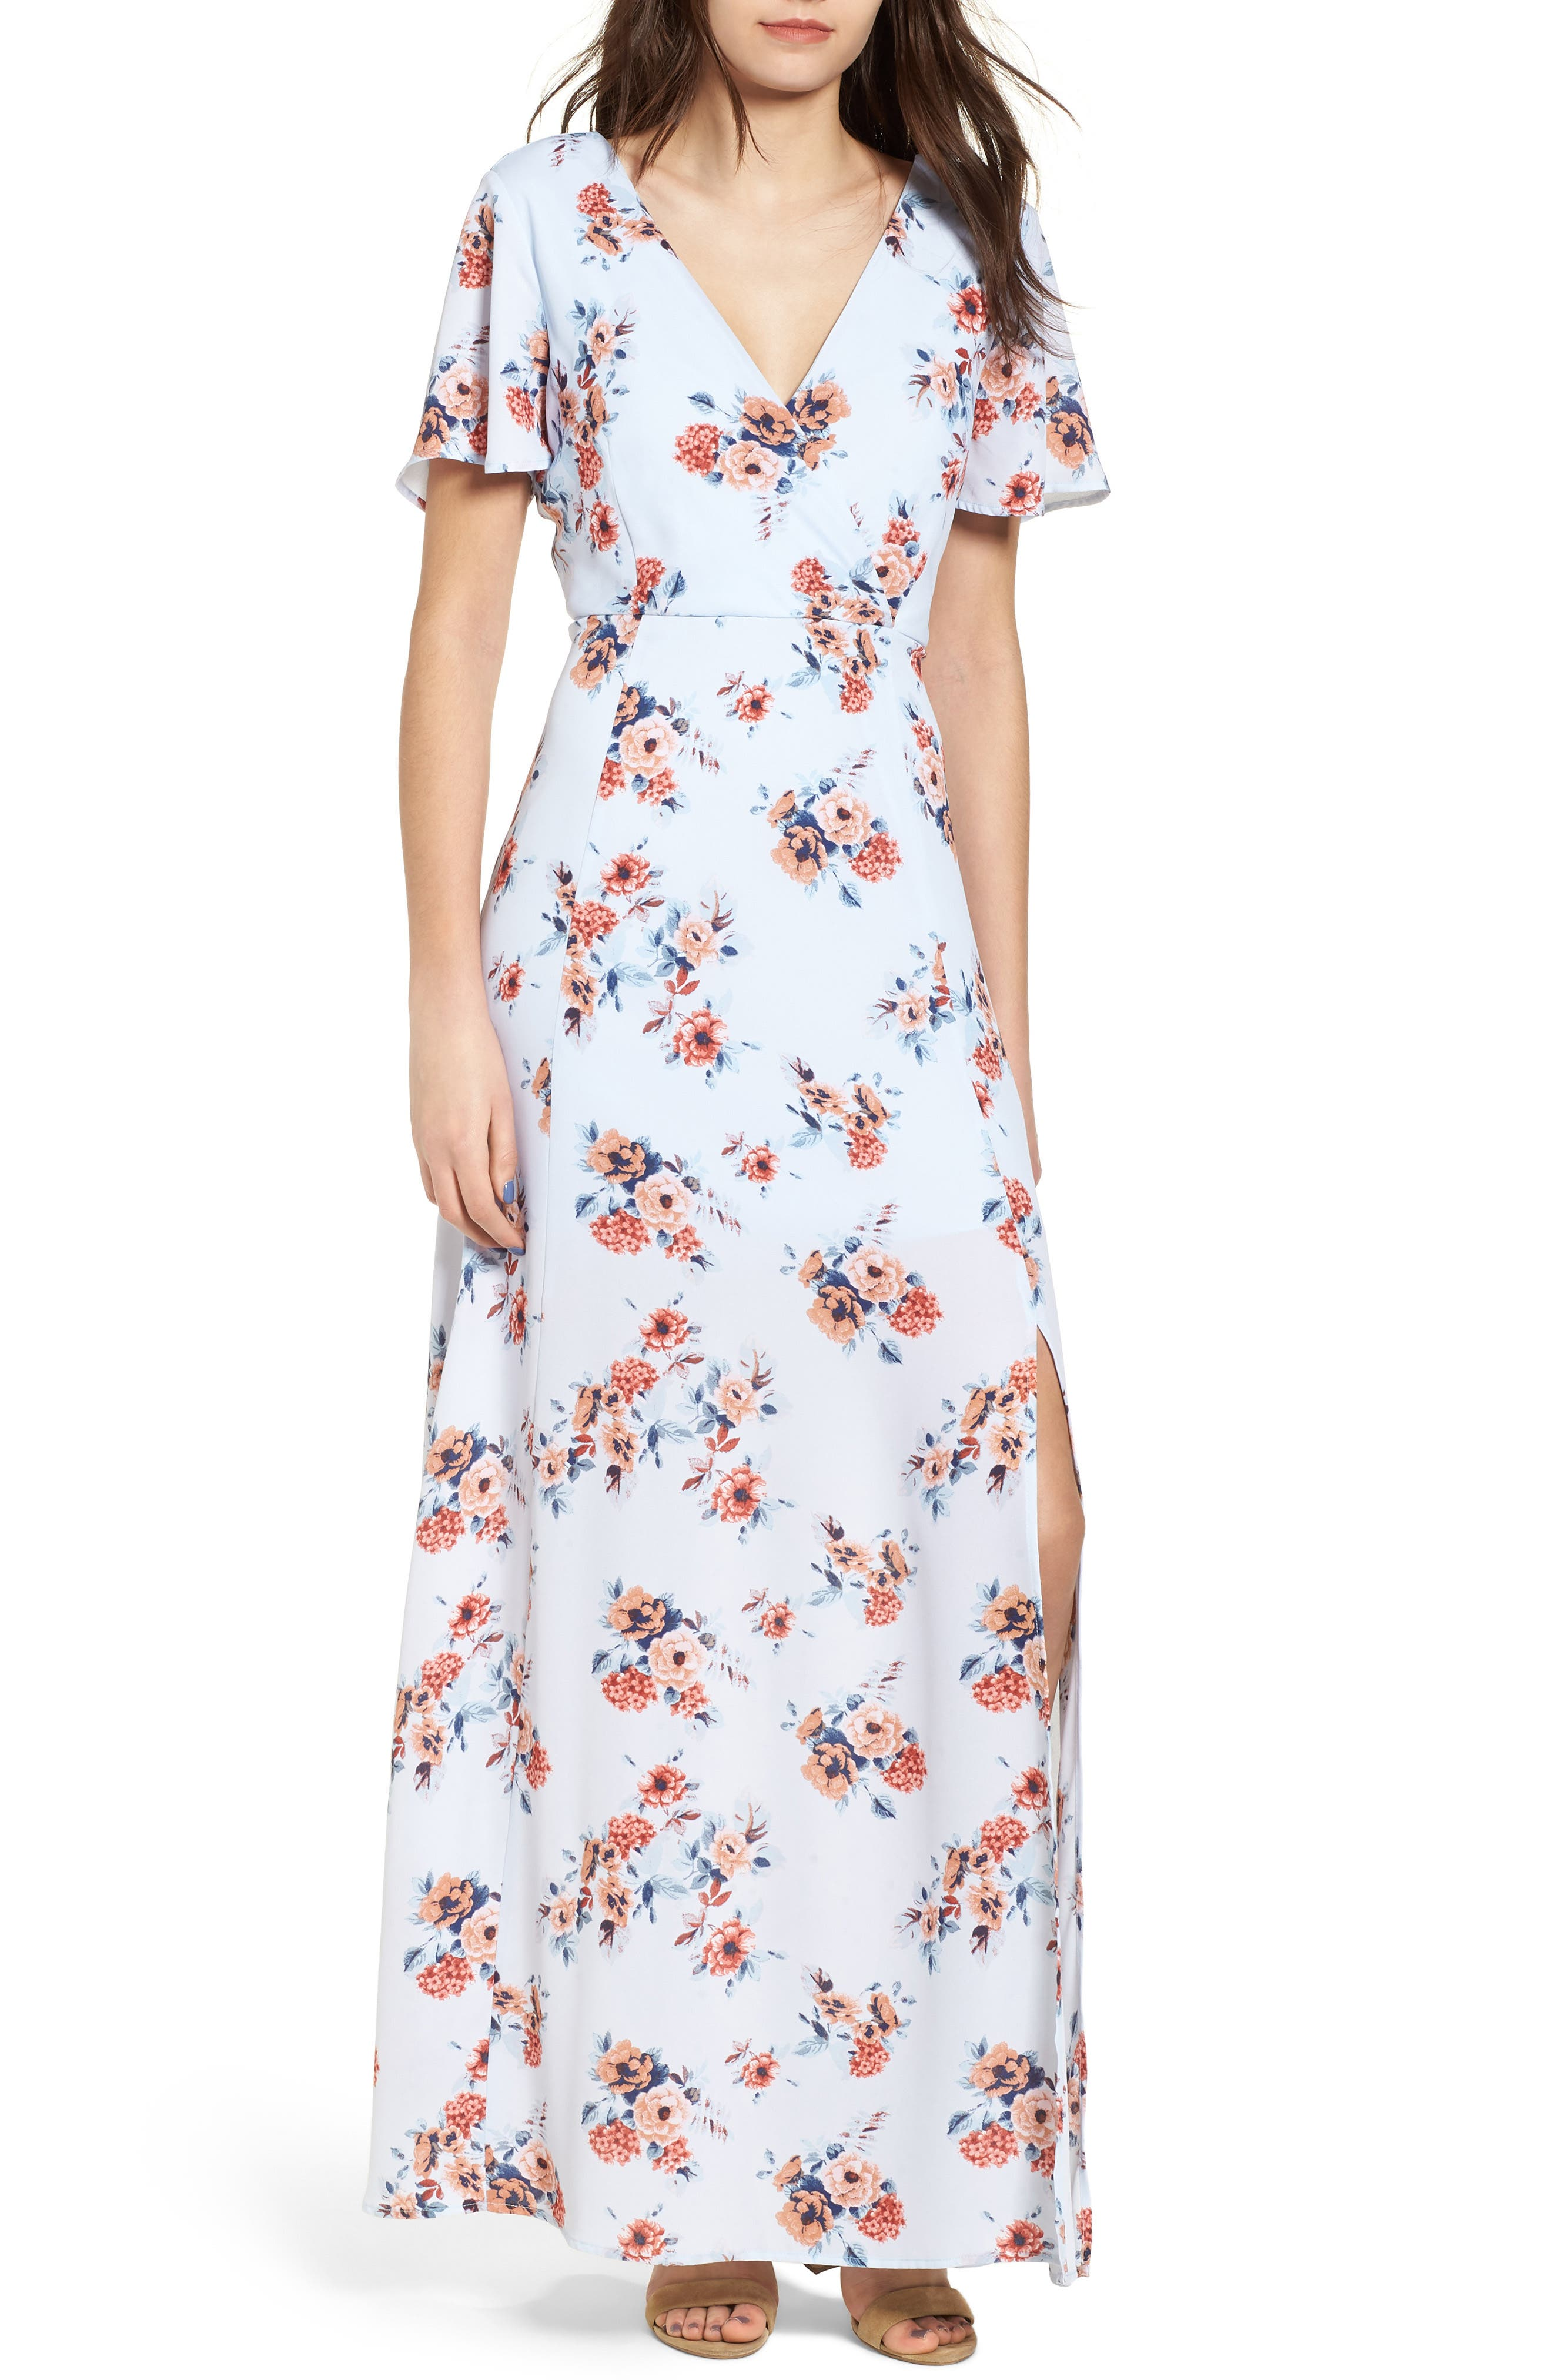 Dee Elly Floral Maxi Dress